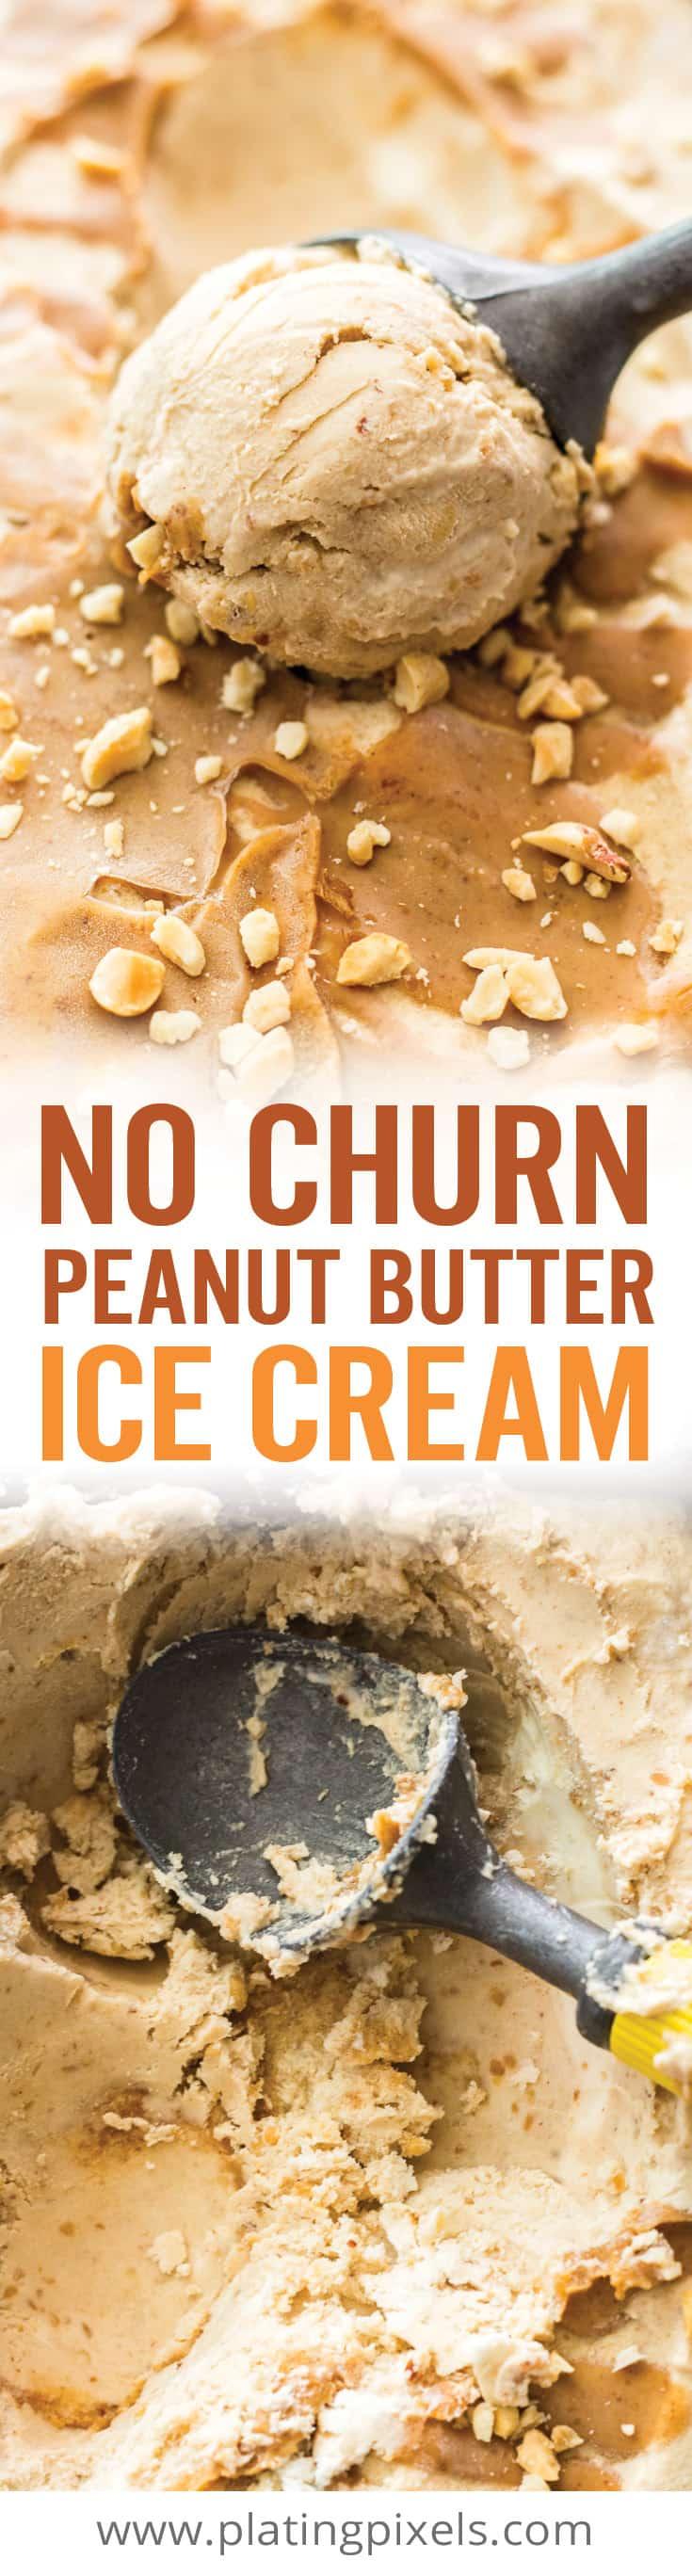 Peanut Butter Ice Cream (No-Churn)